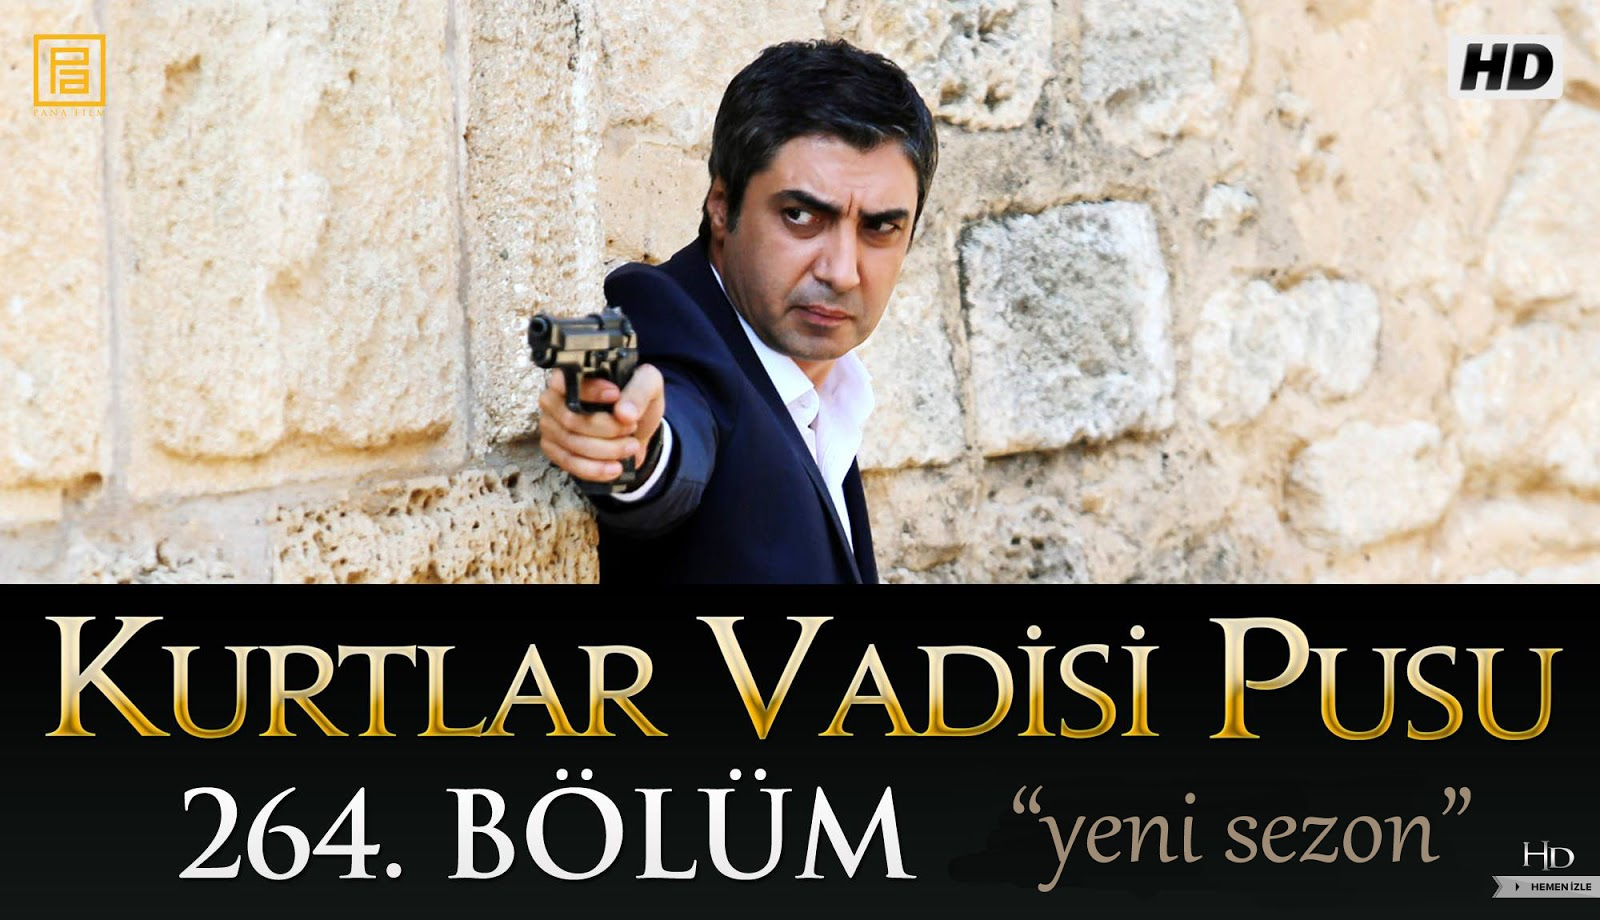 http://thealemdar.blogspot.be/p/kurtlar-vadisi-pusu-264bolum.html